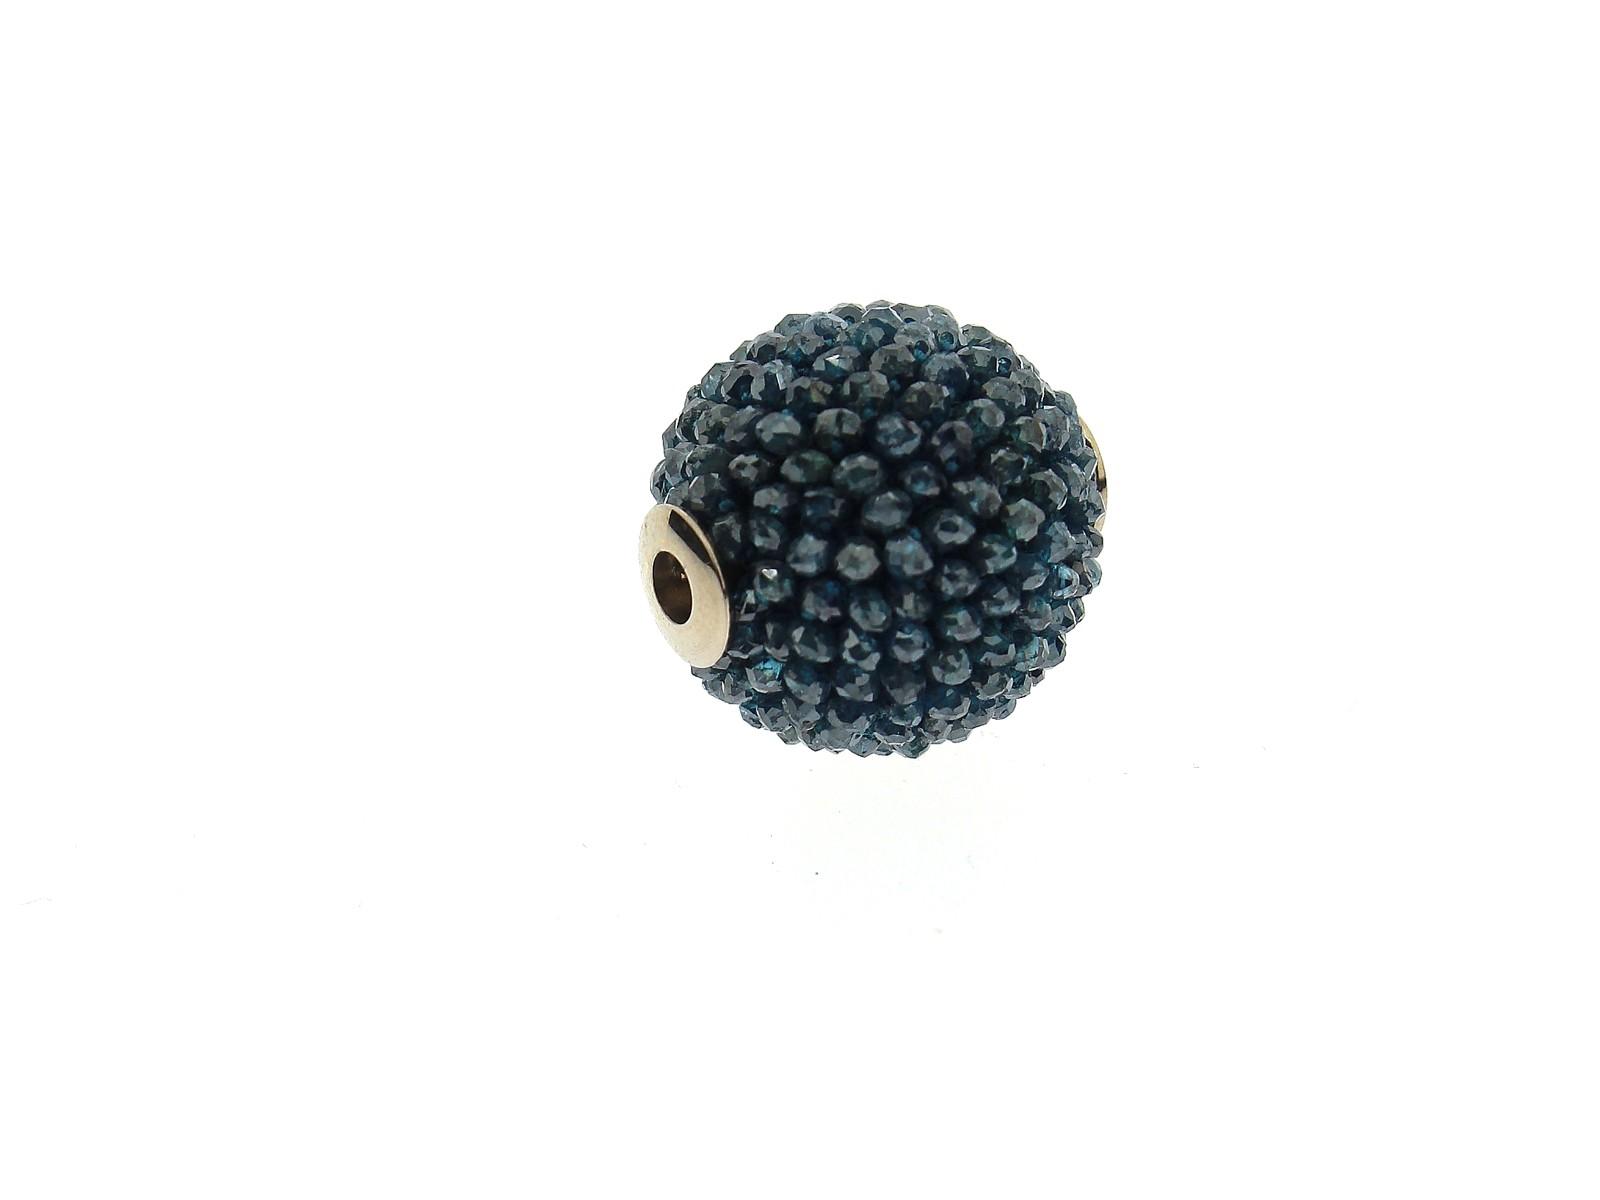 Wechselschließe Diamanten - Köppel, Christine - 90020WG-16